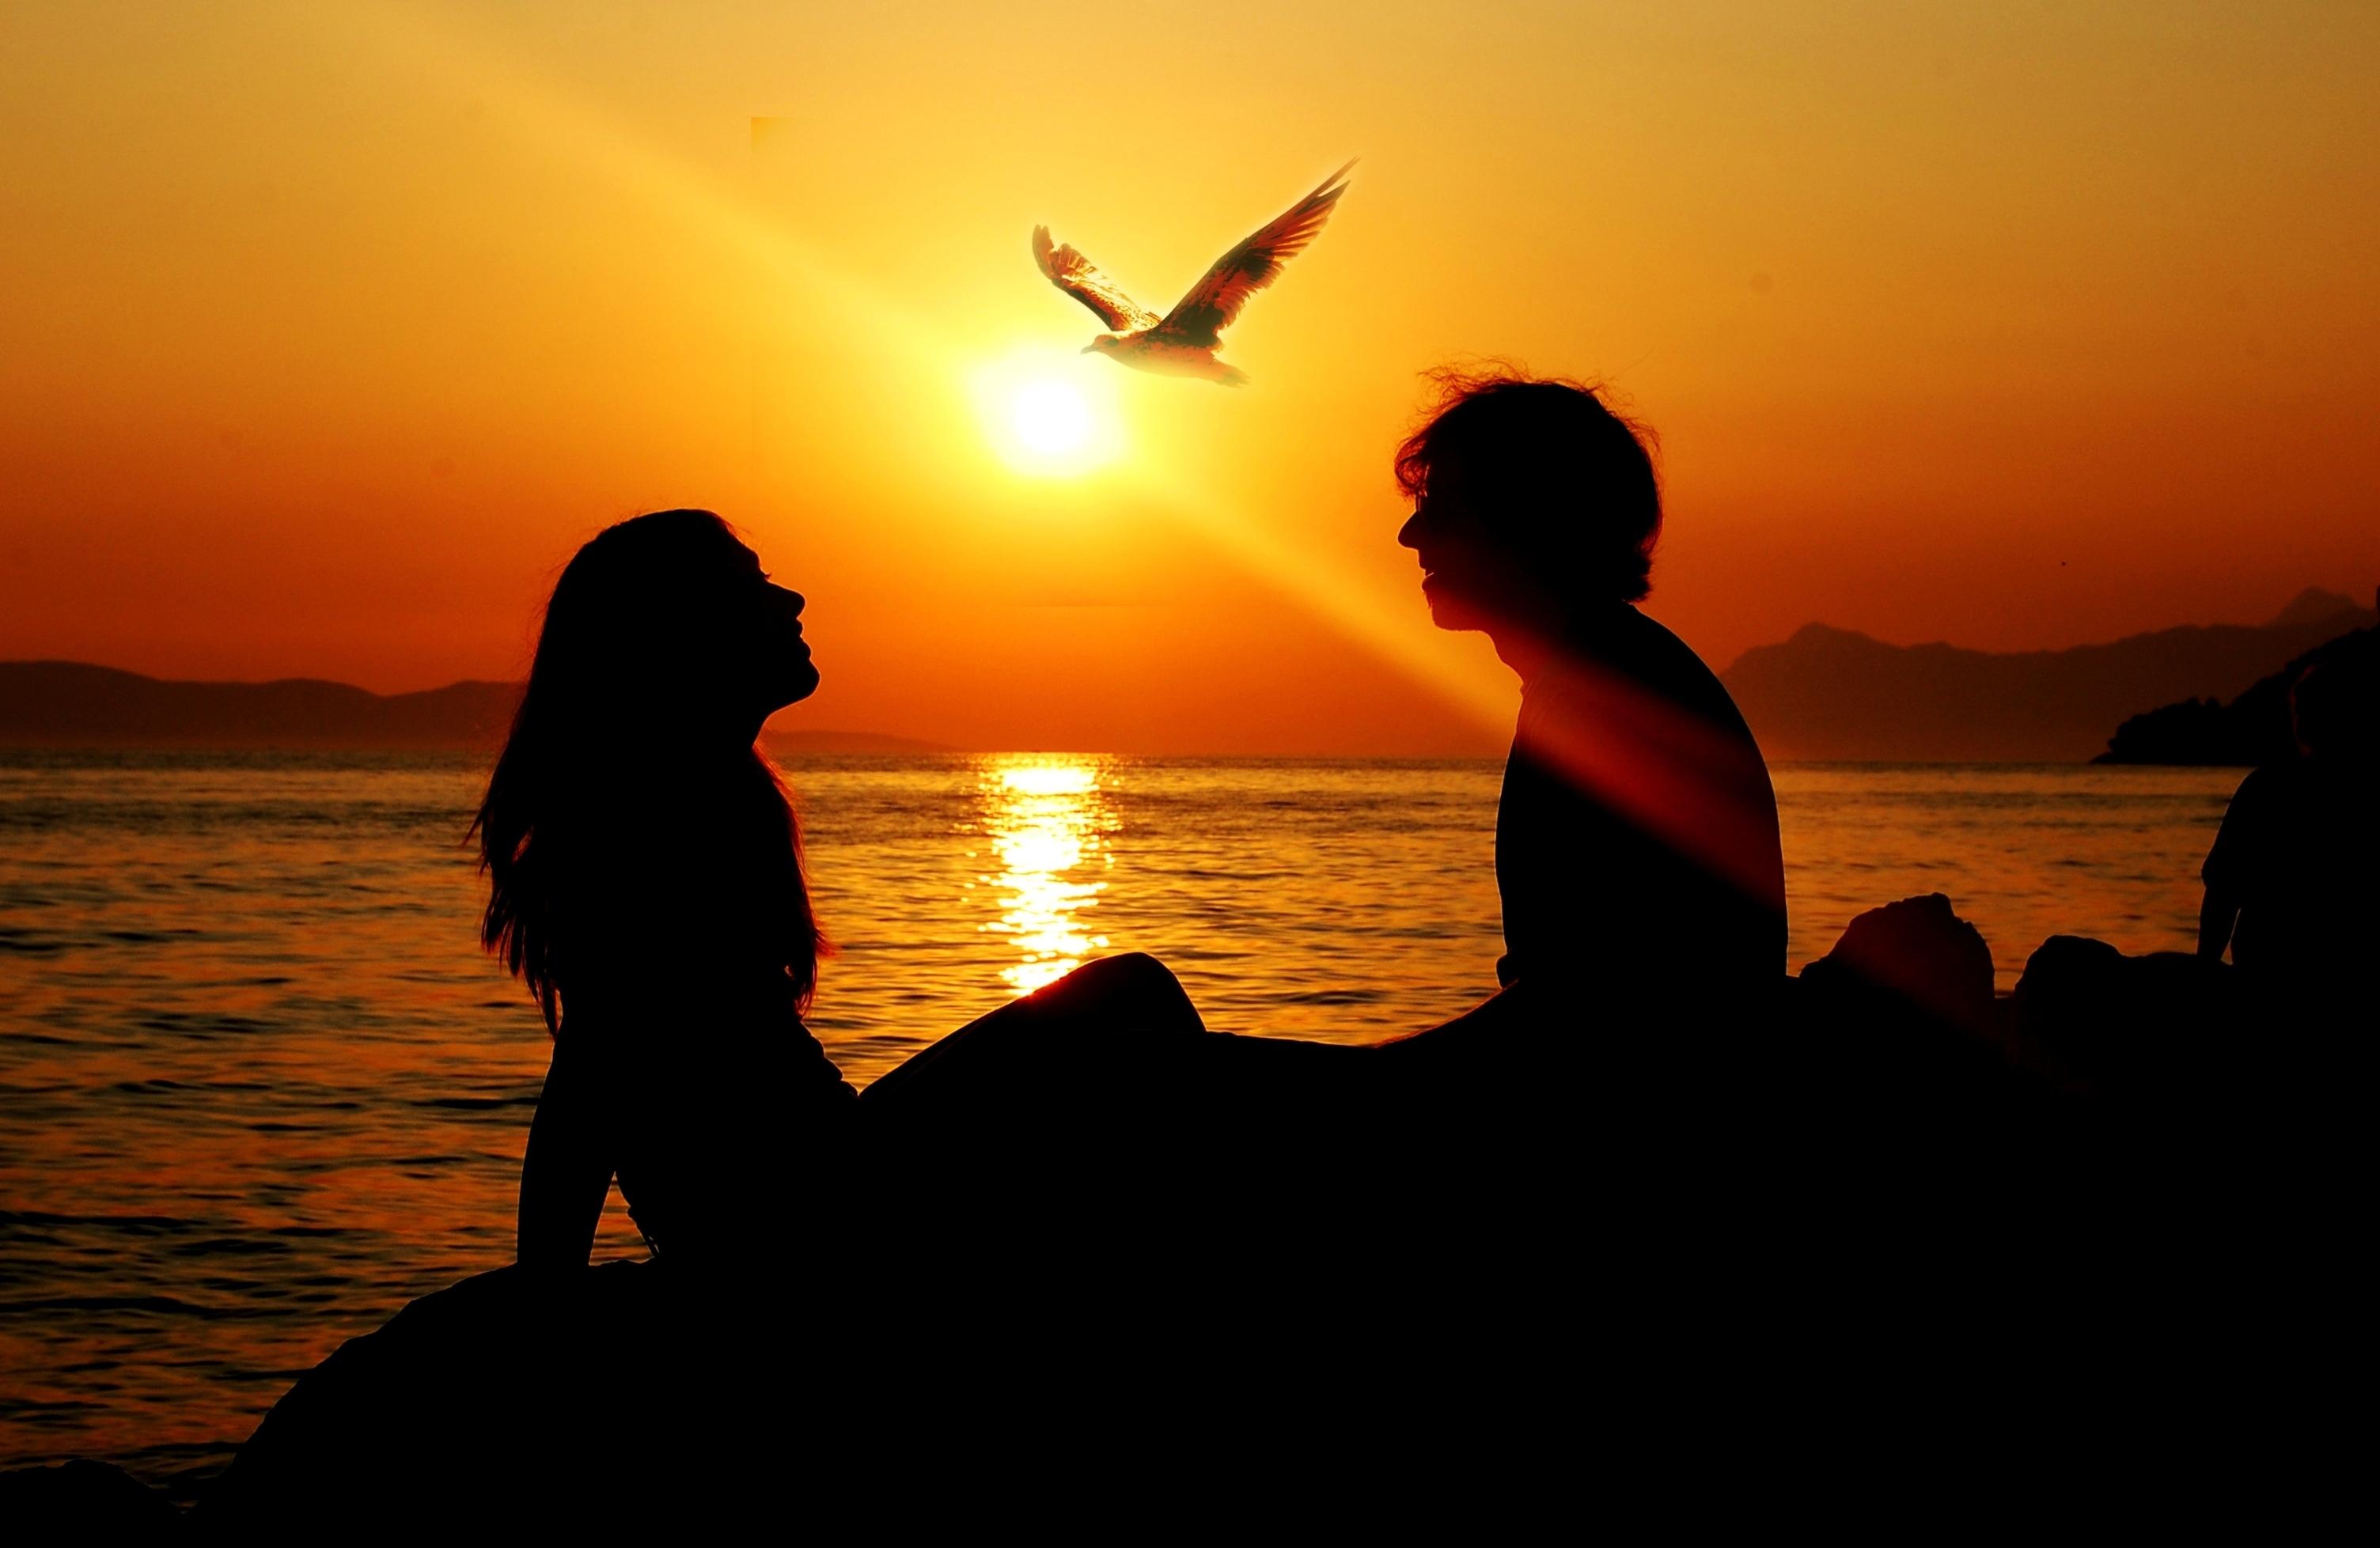 Wallpaper sunlight sunset love silhouette sunrise evening sunlight sunset sea love silhouette sunrise evening morning sun horizon summer dusk freedom ray dawn bird altavistaventures Images